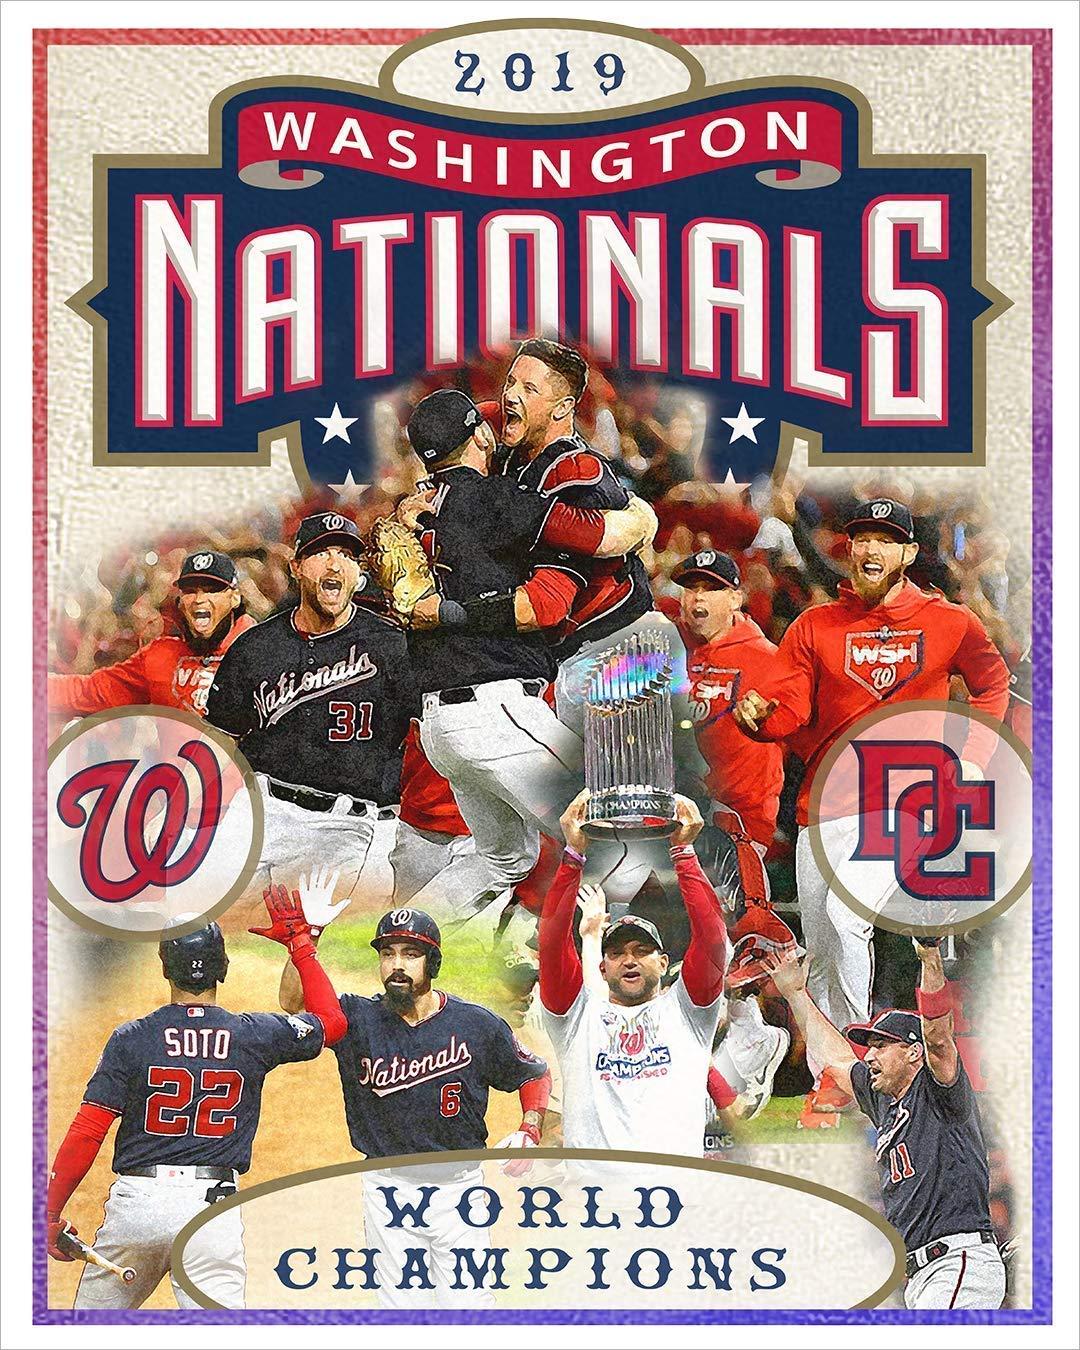 Washington Nationals World Series Poster Baseball 11x17 16x20 22x28 24x36 27x40